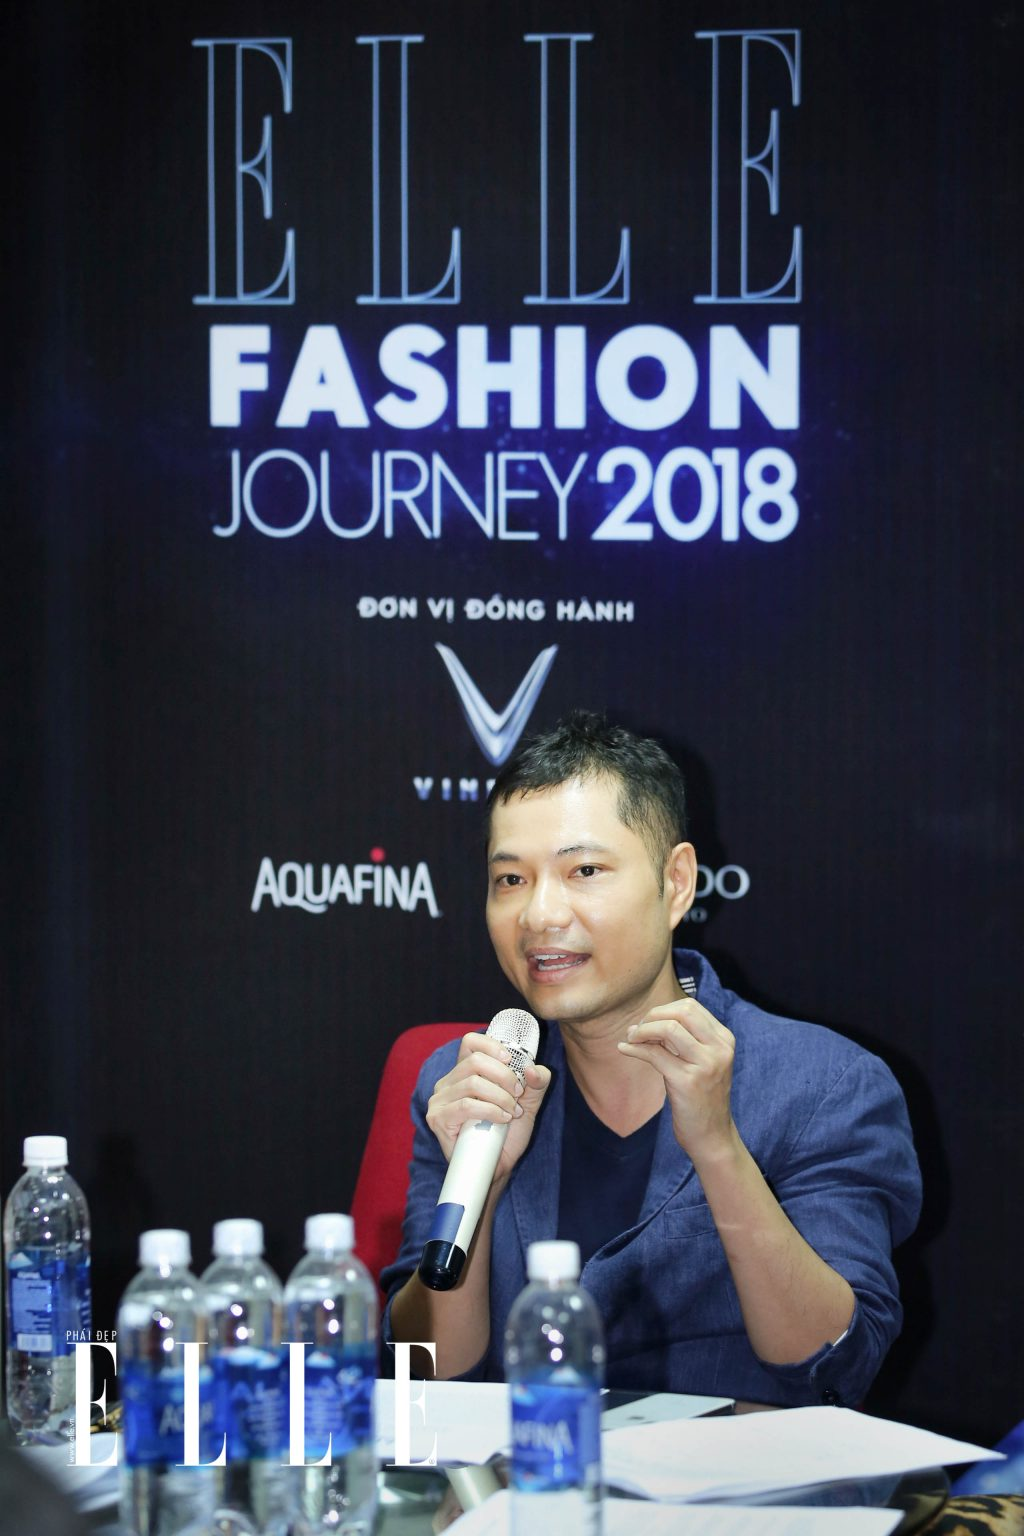 ELLE Fashion Journey 2018 4